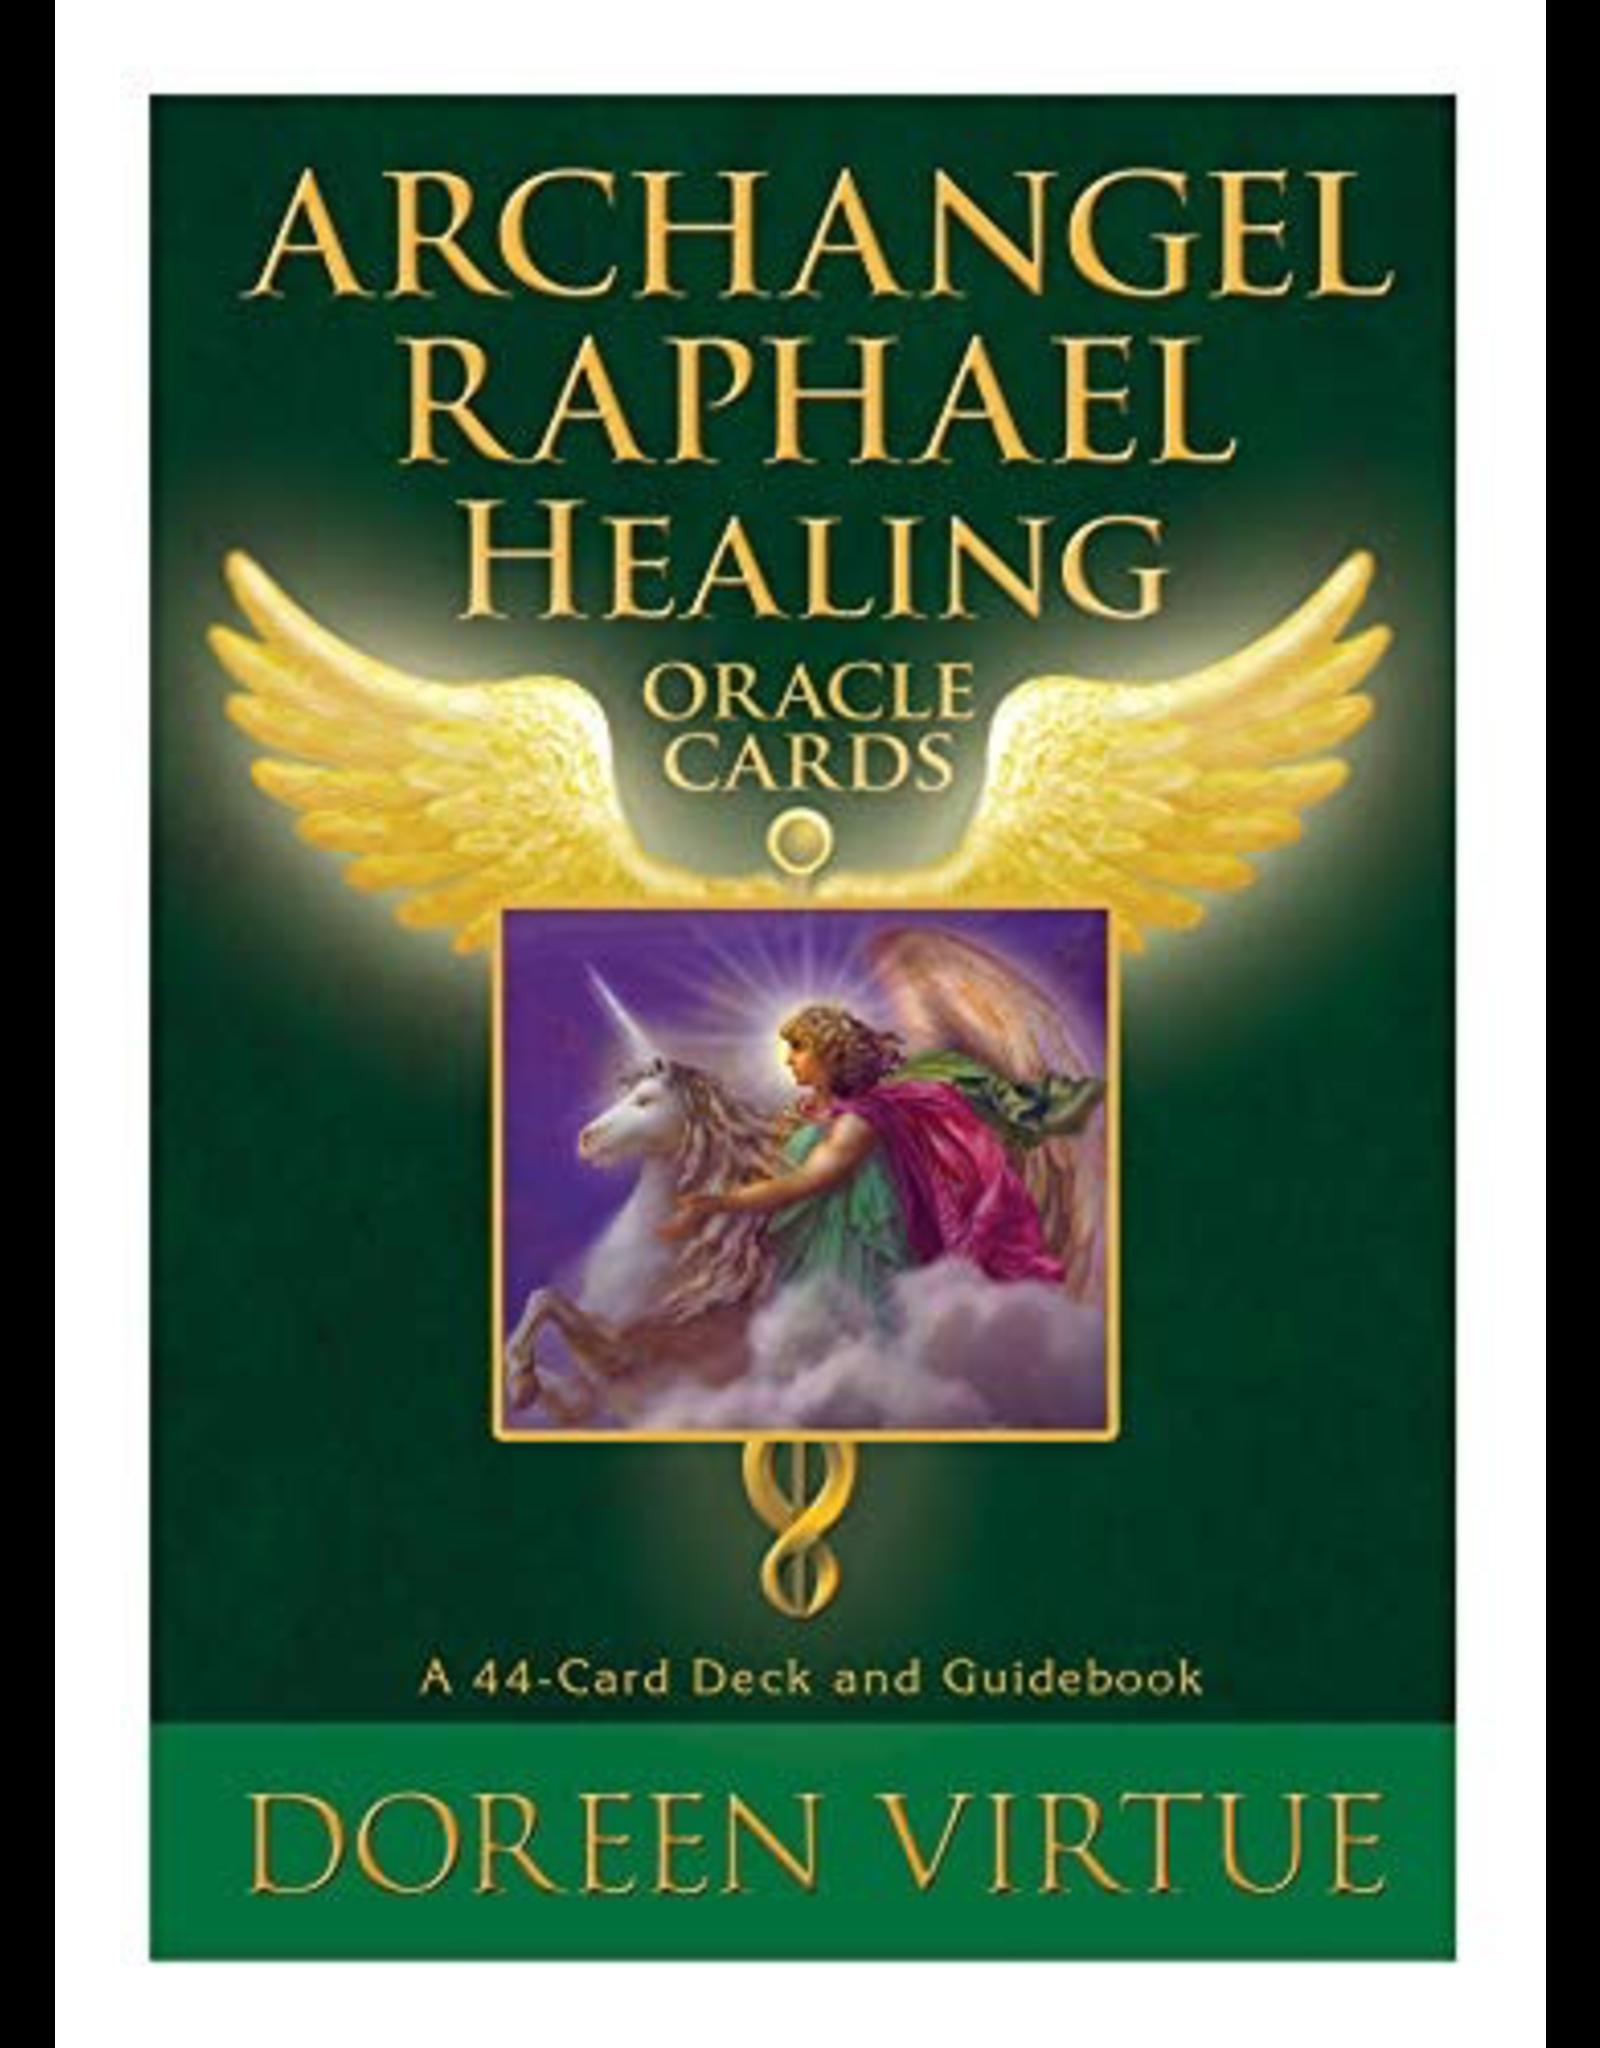 Ingram Archangel Raphel Healing Tarot